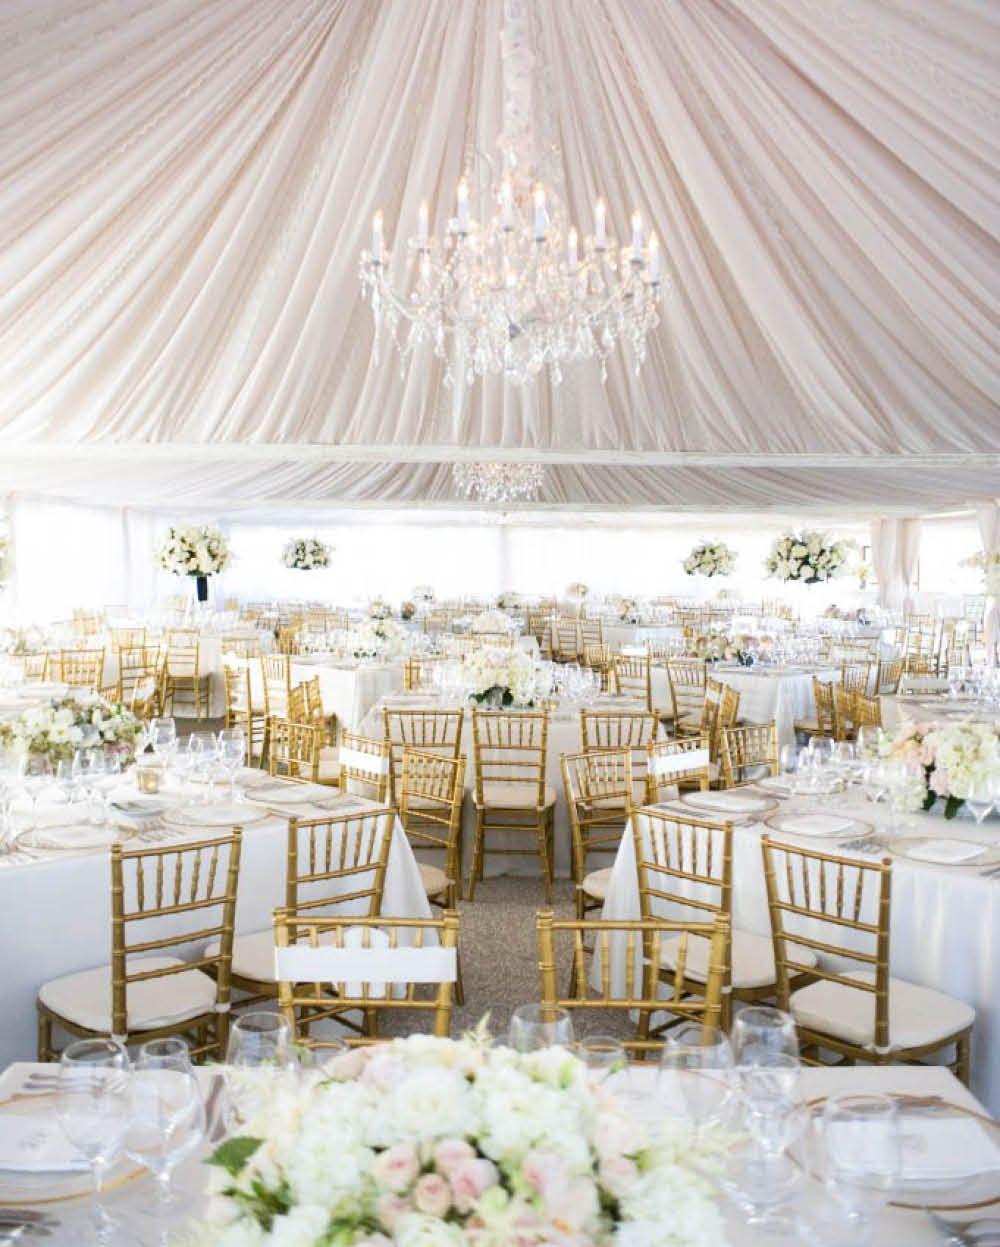 BCBGMAXAZRIA 2016 Bridal Story. Venues, Outdoor